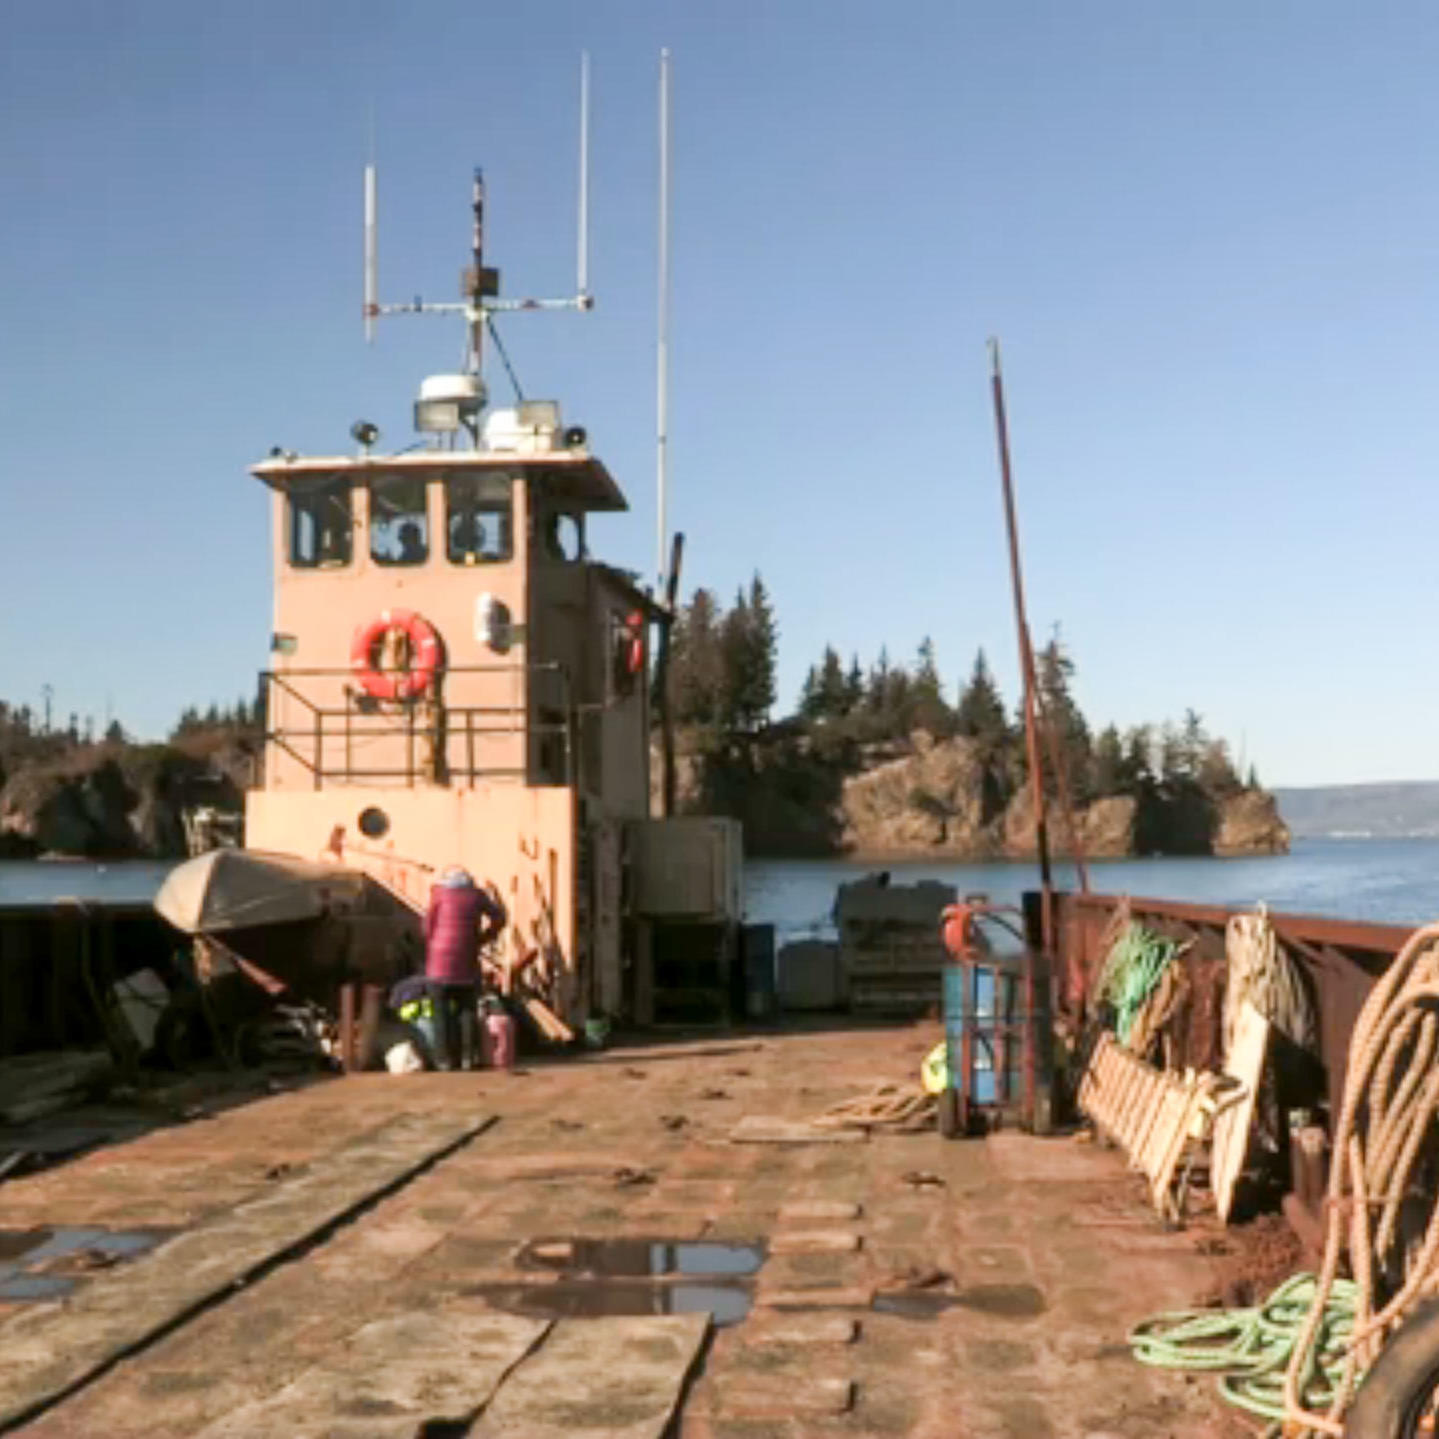 The Alaskan Barter System